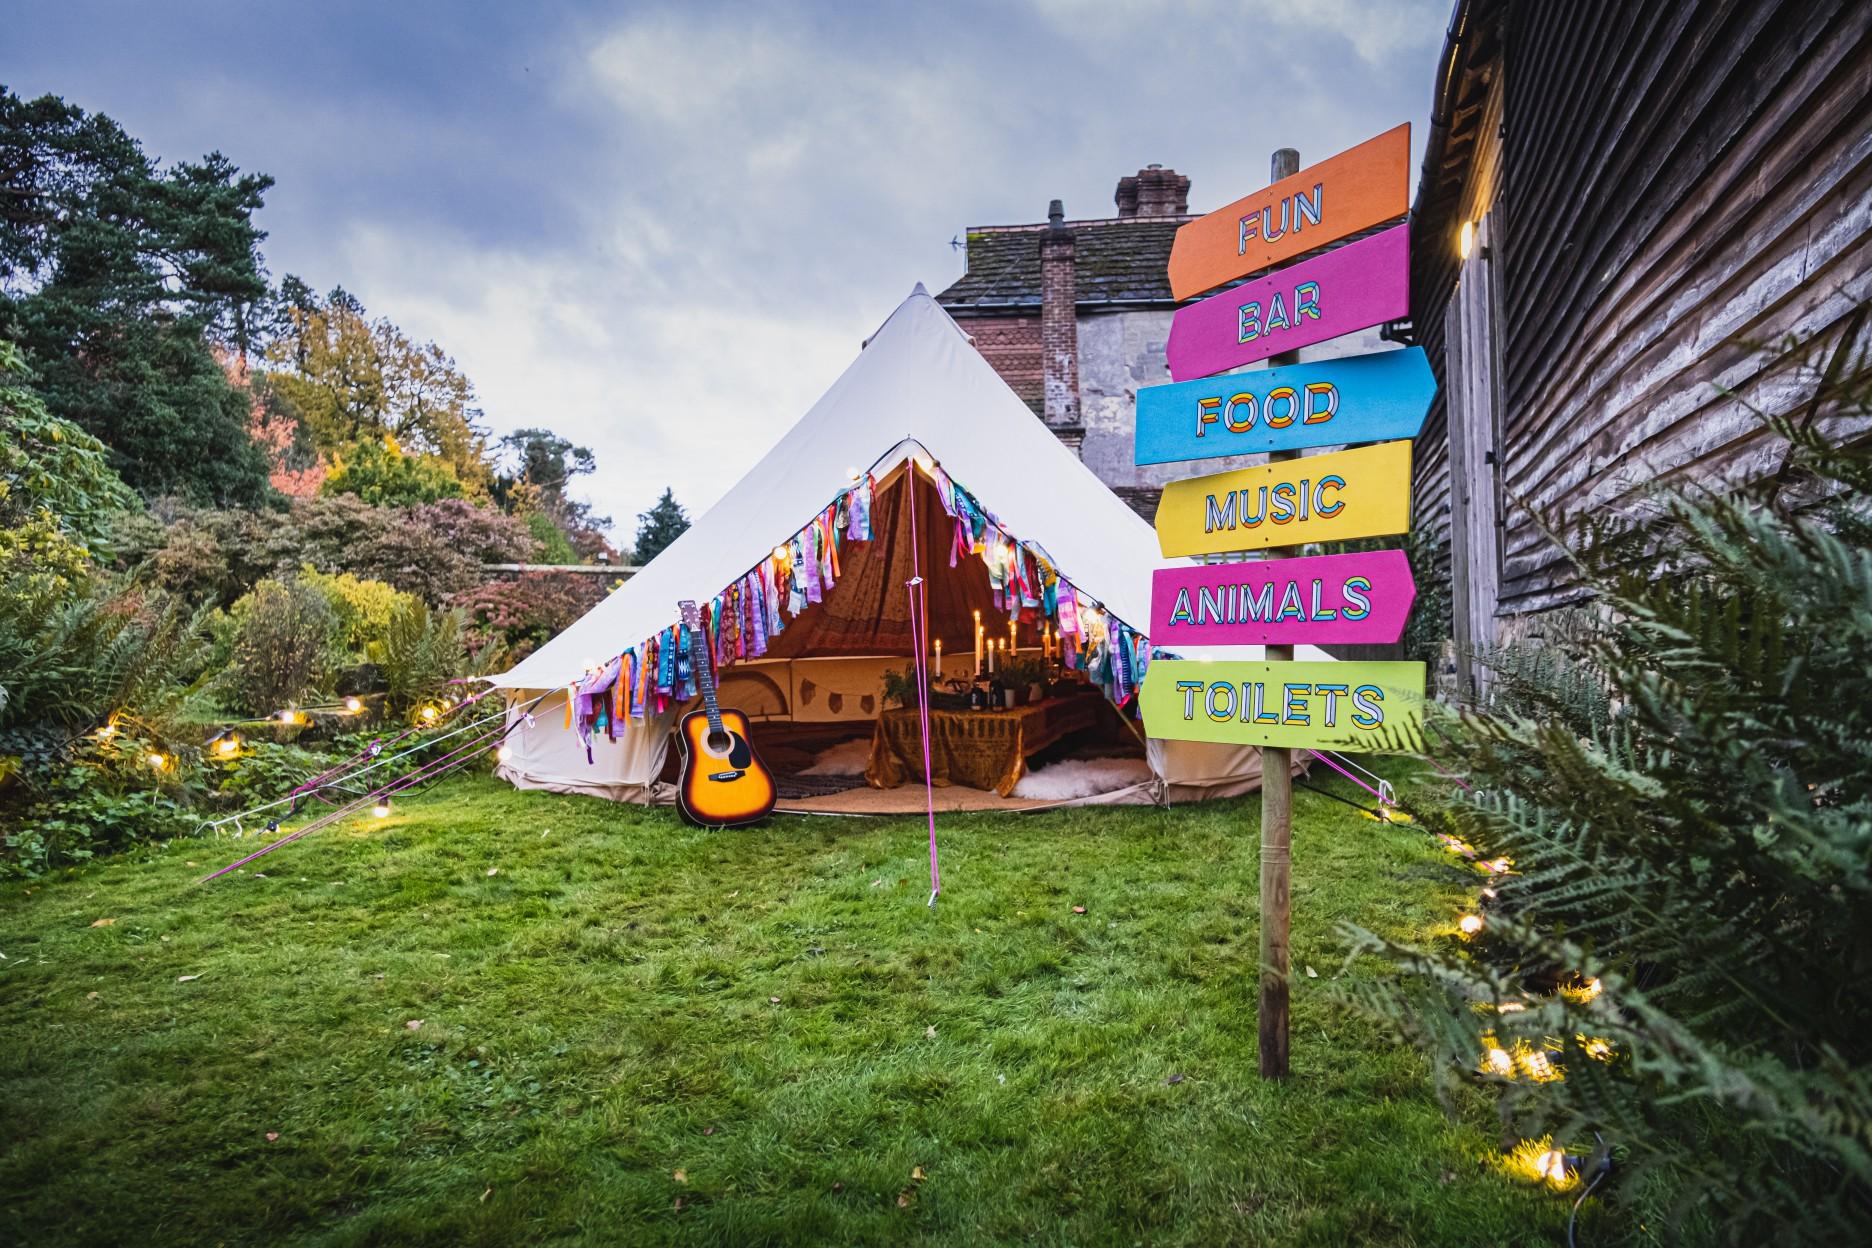 colourful micro wedding at patricks barn - festival wedding - raainbow wedding - bell tent wedding - unique wedding signage